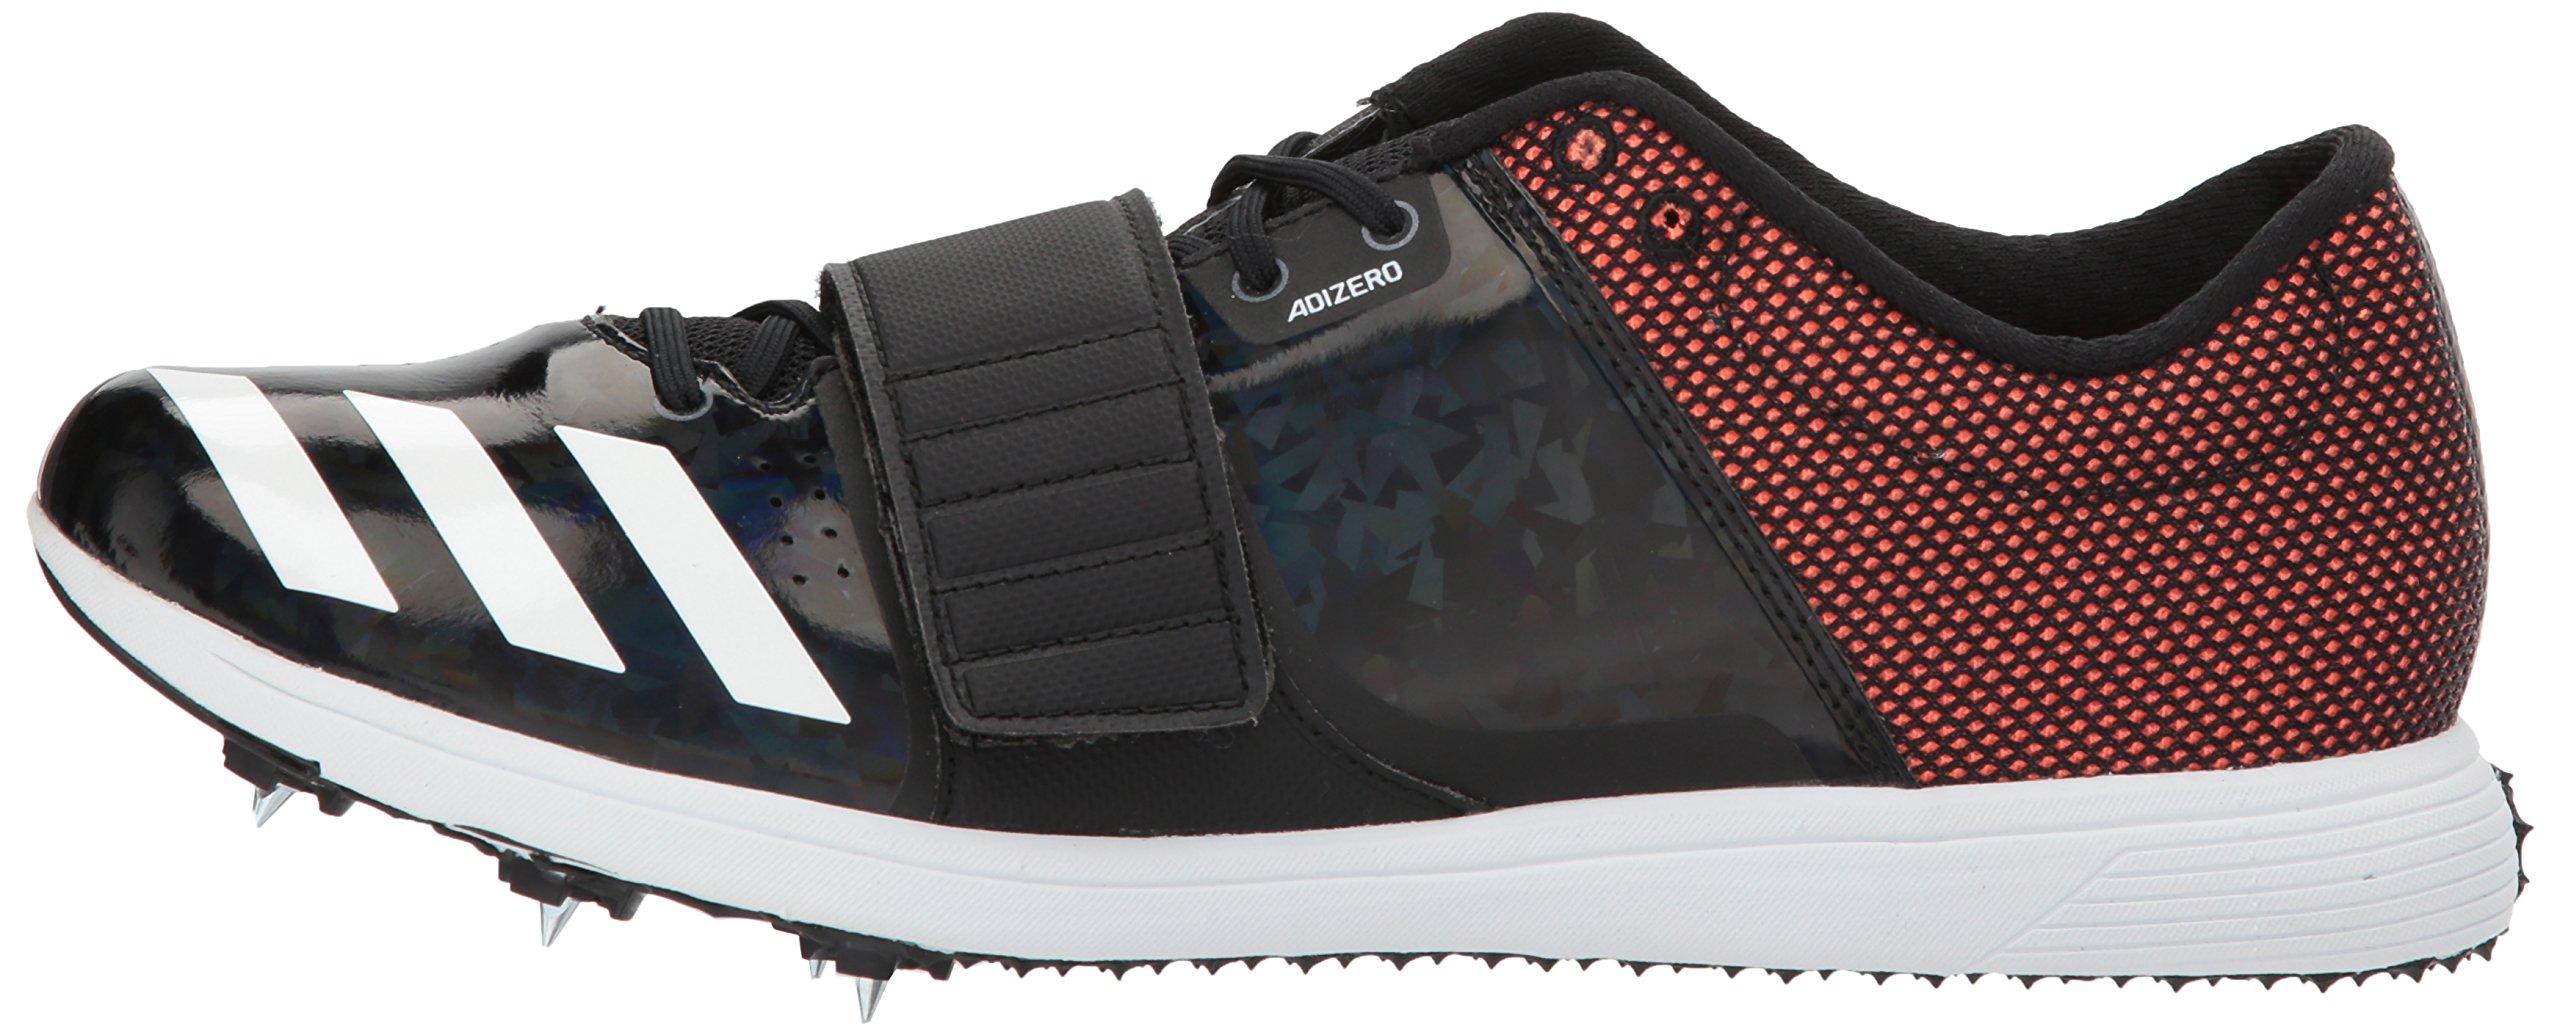 adidas Adizero tj/pv Running Shoe core Black, FTWR White, Orange 13.5 M US by adidas (Image #5)